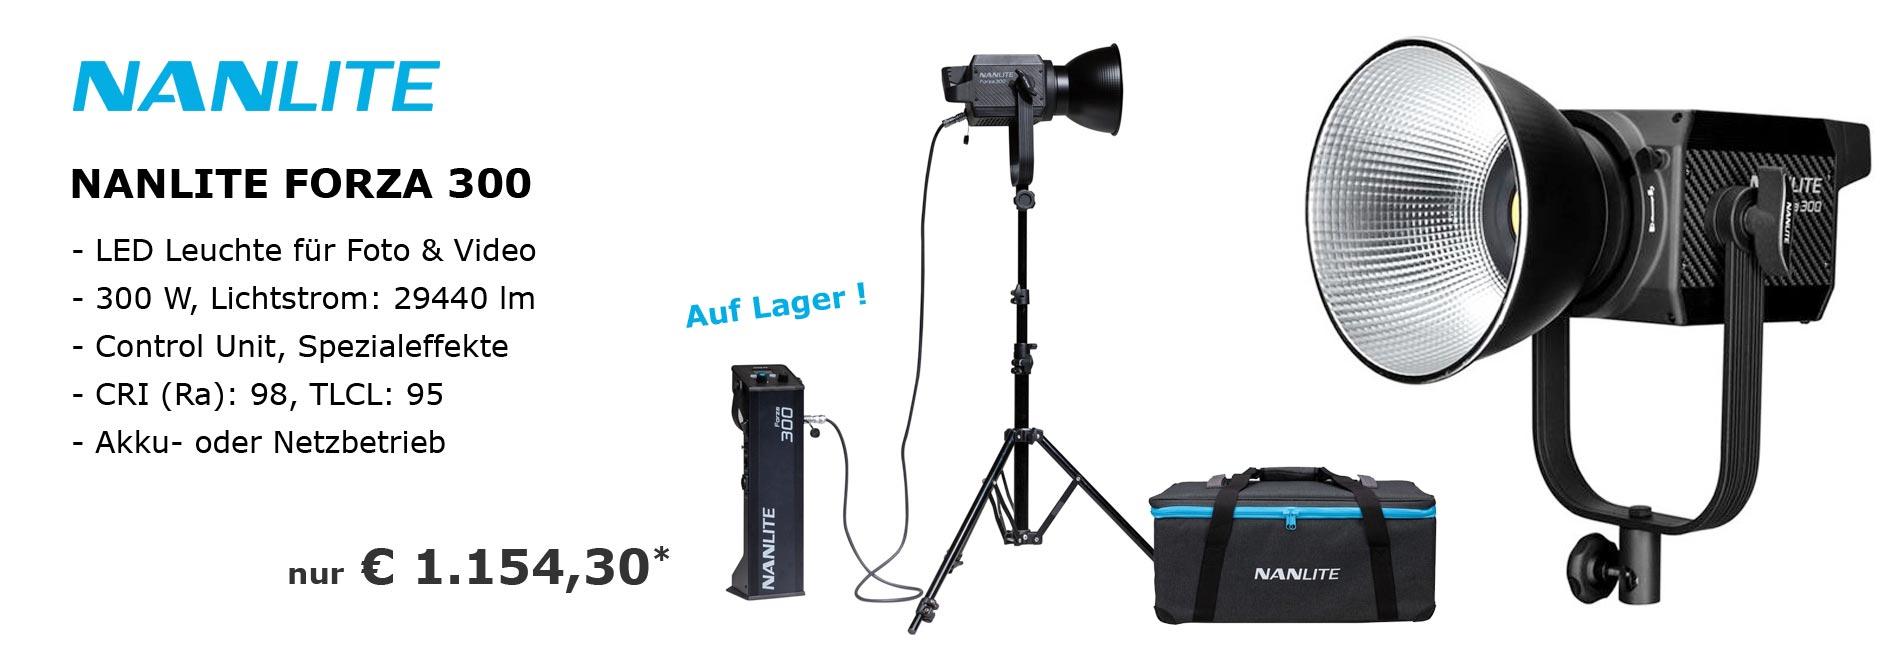 NANLITE FORZA 300 LED Studio-Leuchte für Foto und Video